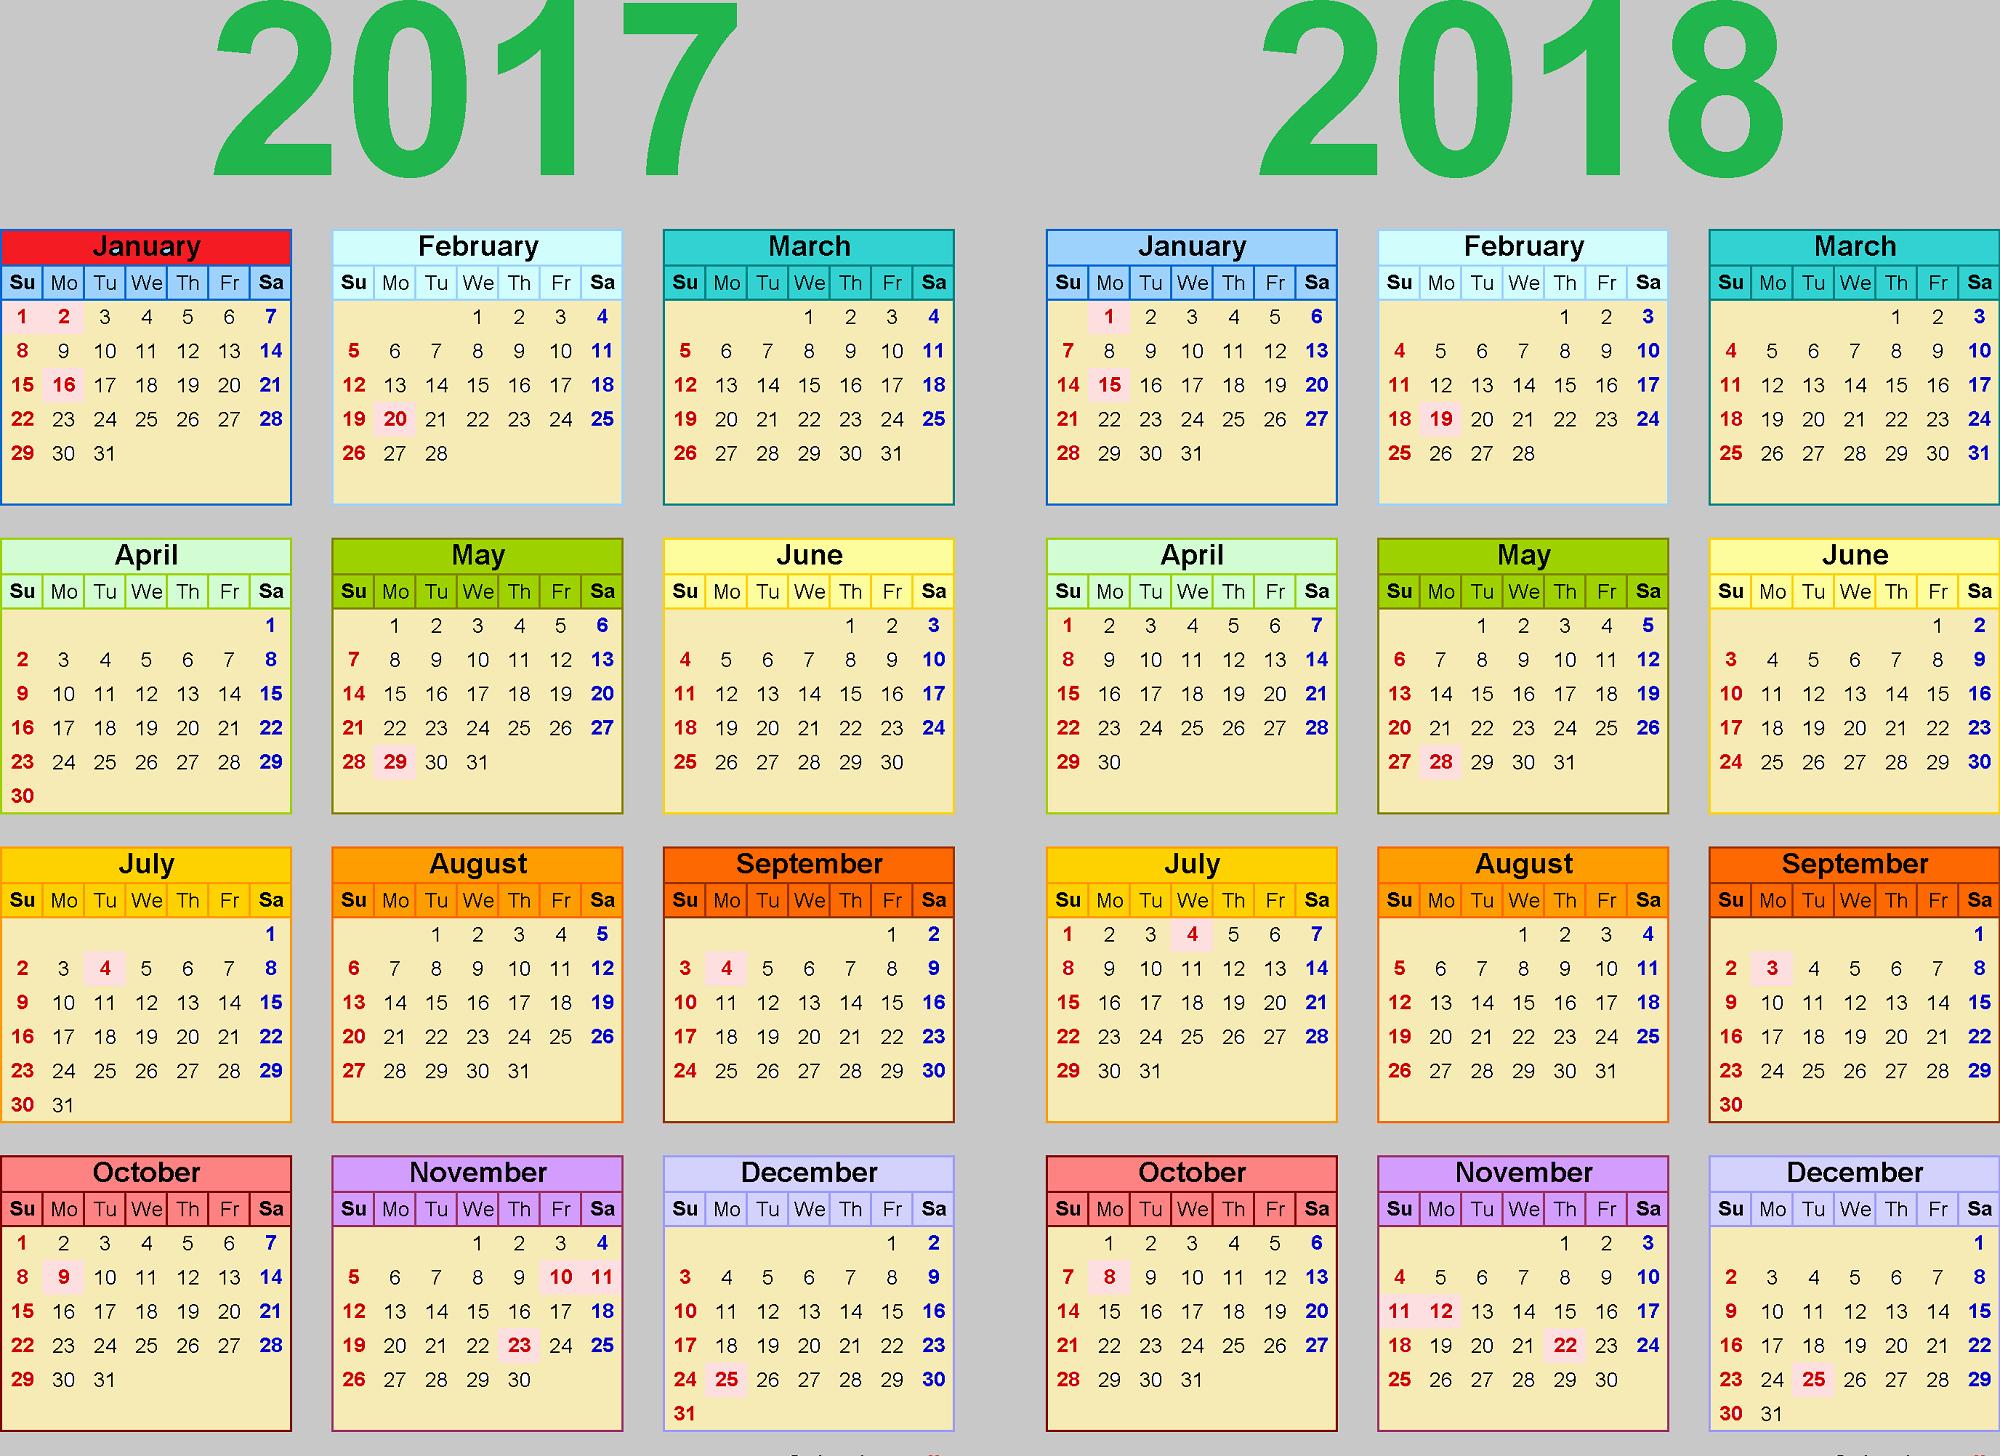 2017-2018 Blank Calendar New 2017 2018 Printable Calendars